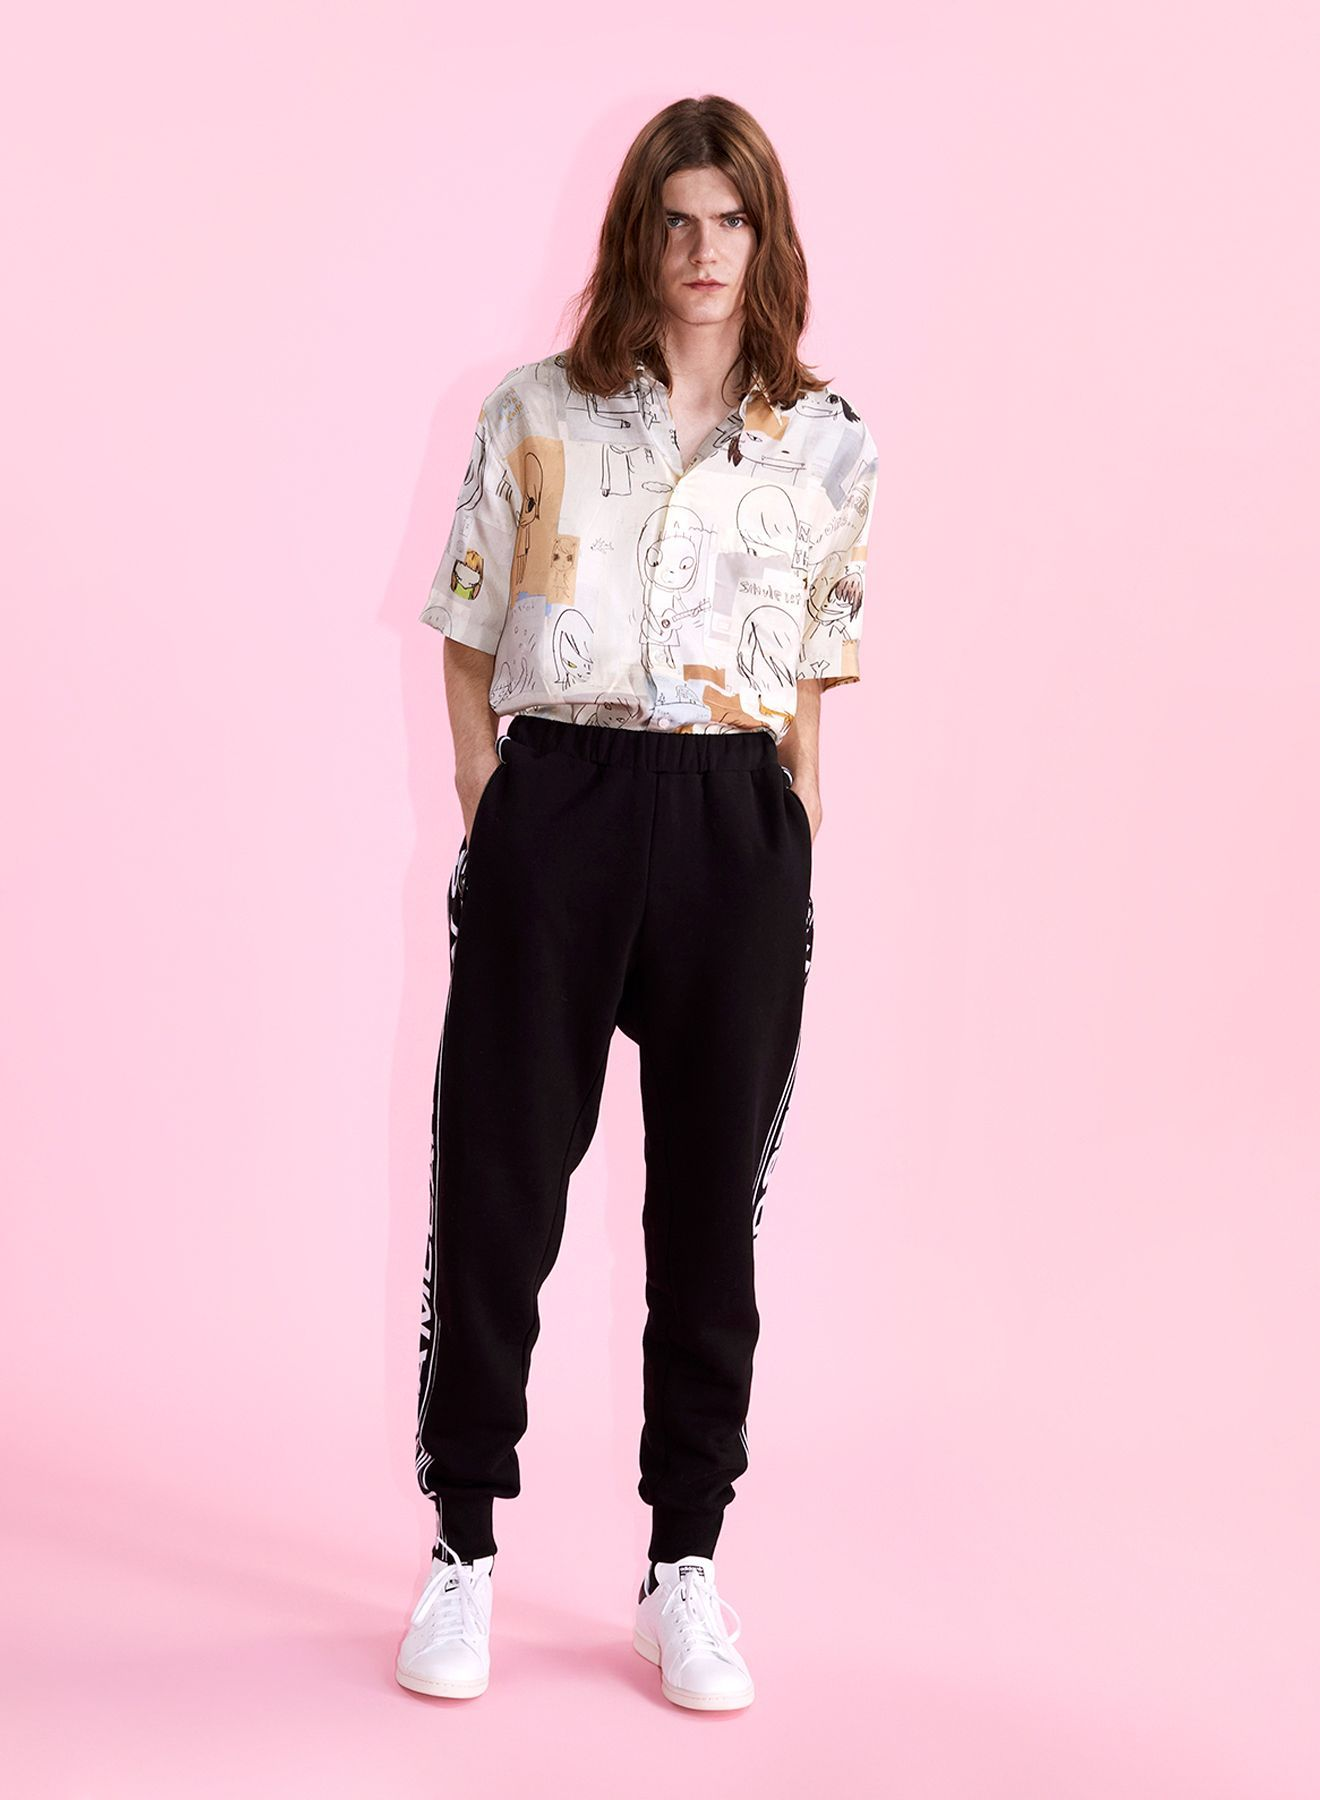 Stella McCartney And Yoshitomo Nara Collaborate For A Genderless Fashion Capsule